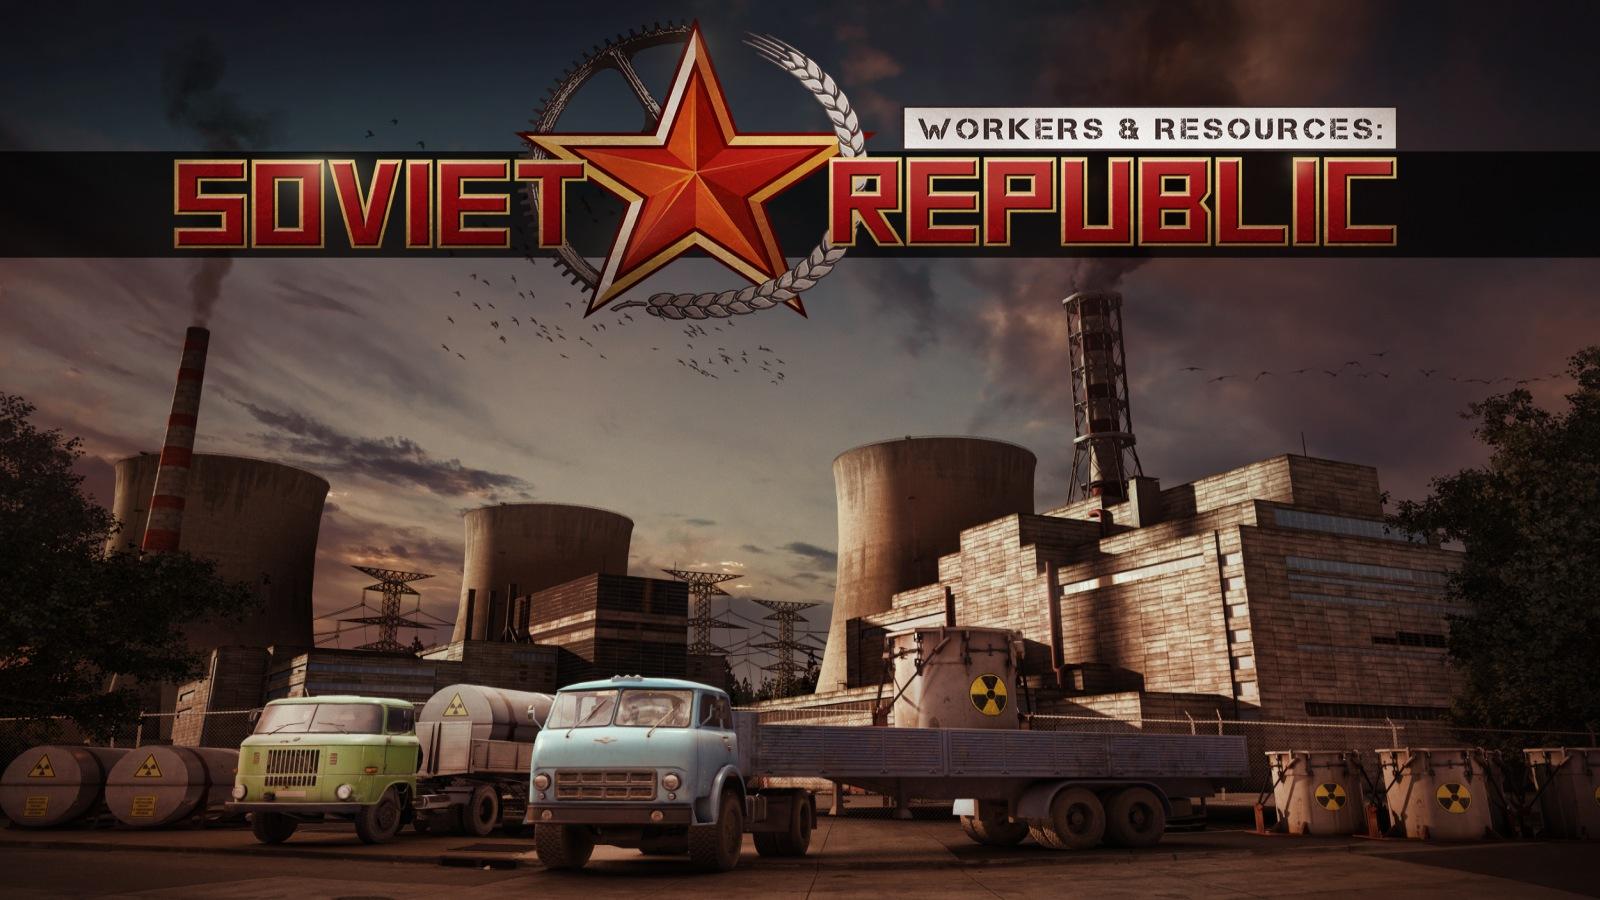 Workers & Resources: Soviet Republic - Update #4 Artwork | 3DIVISION